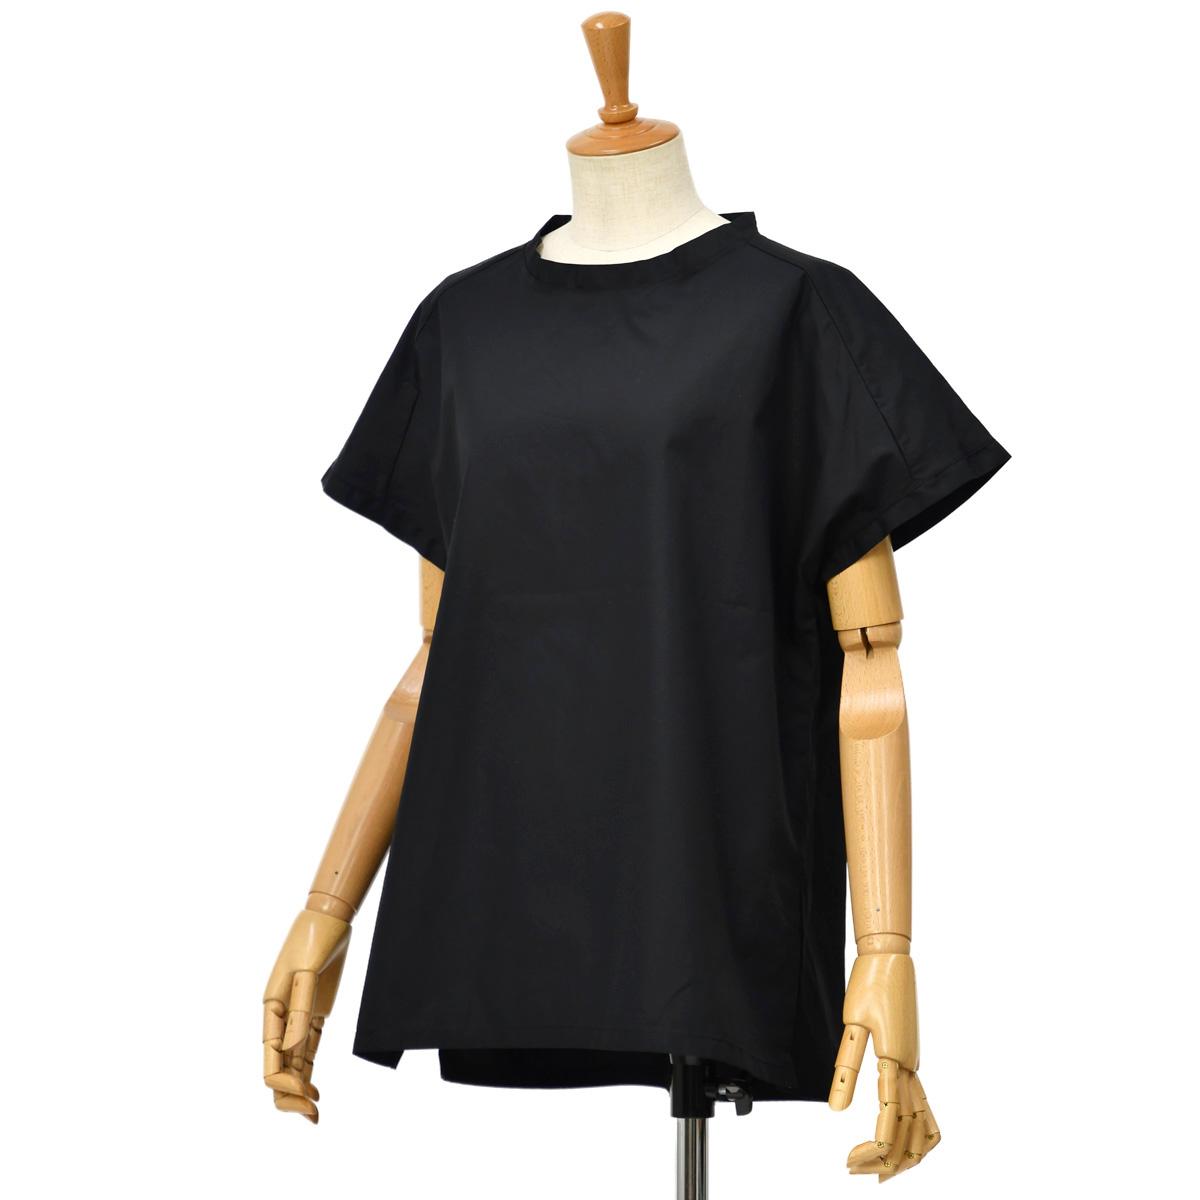 BARENA VENEZIA【バレナ ヴェネチア】半袖ブラウス TSD2747 2383 T-Shirt Eater BAgio Nero コットン ブラック